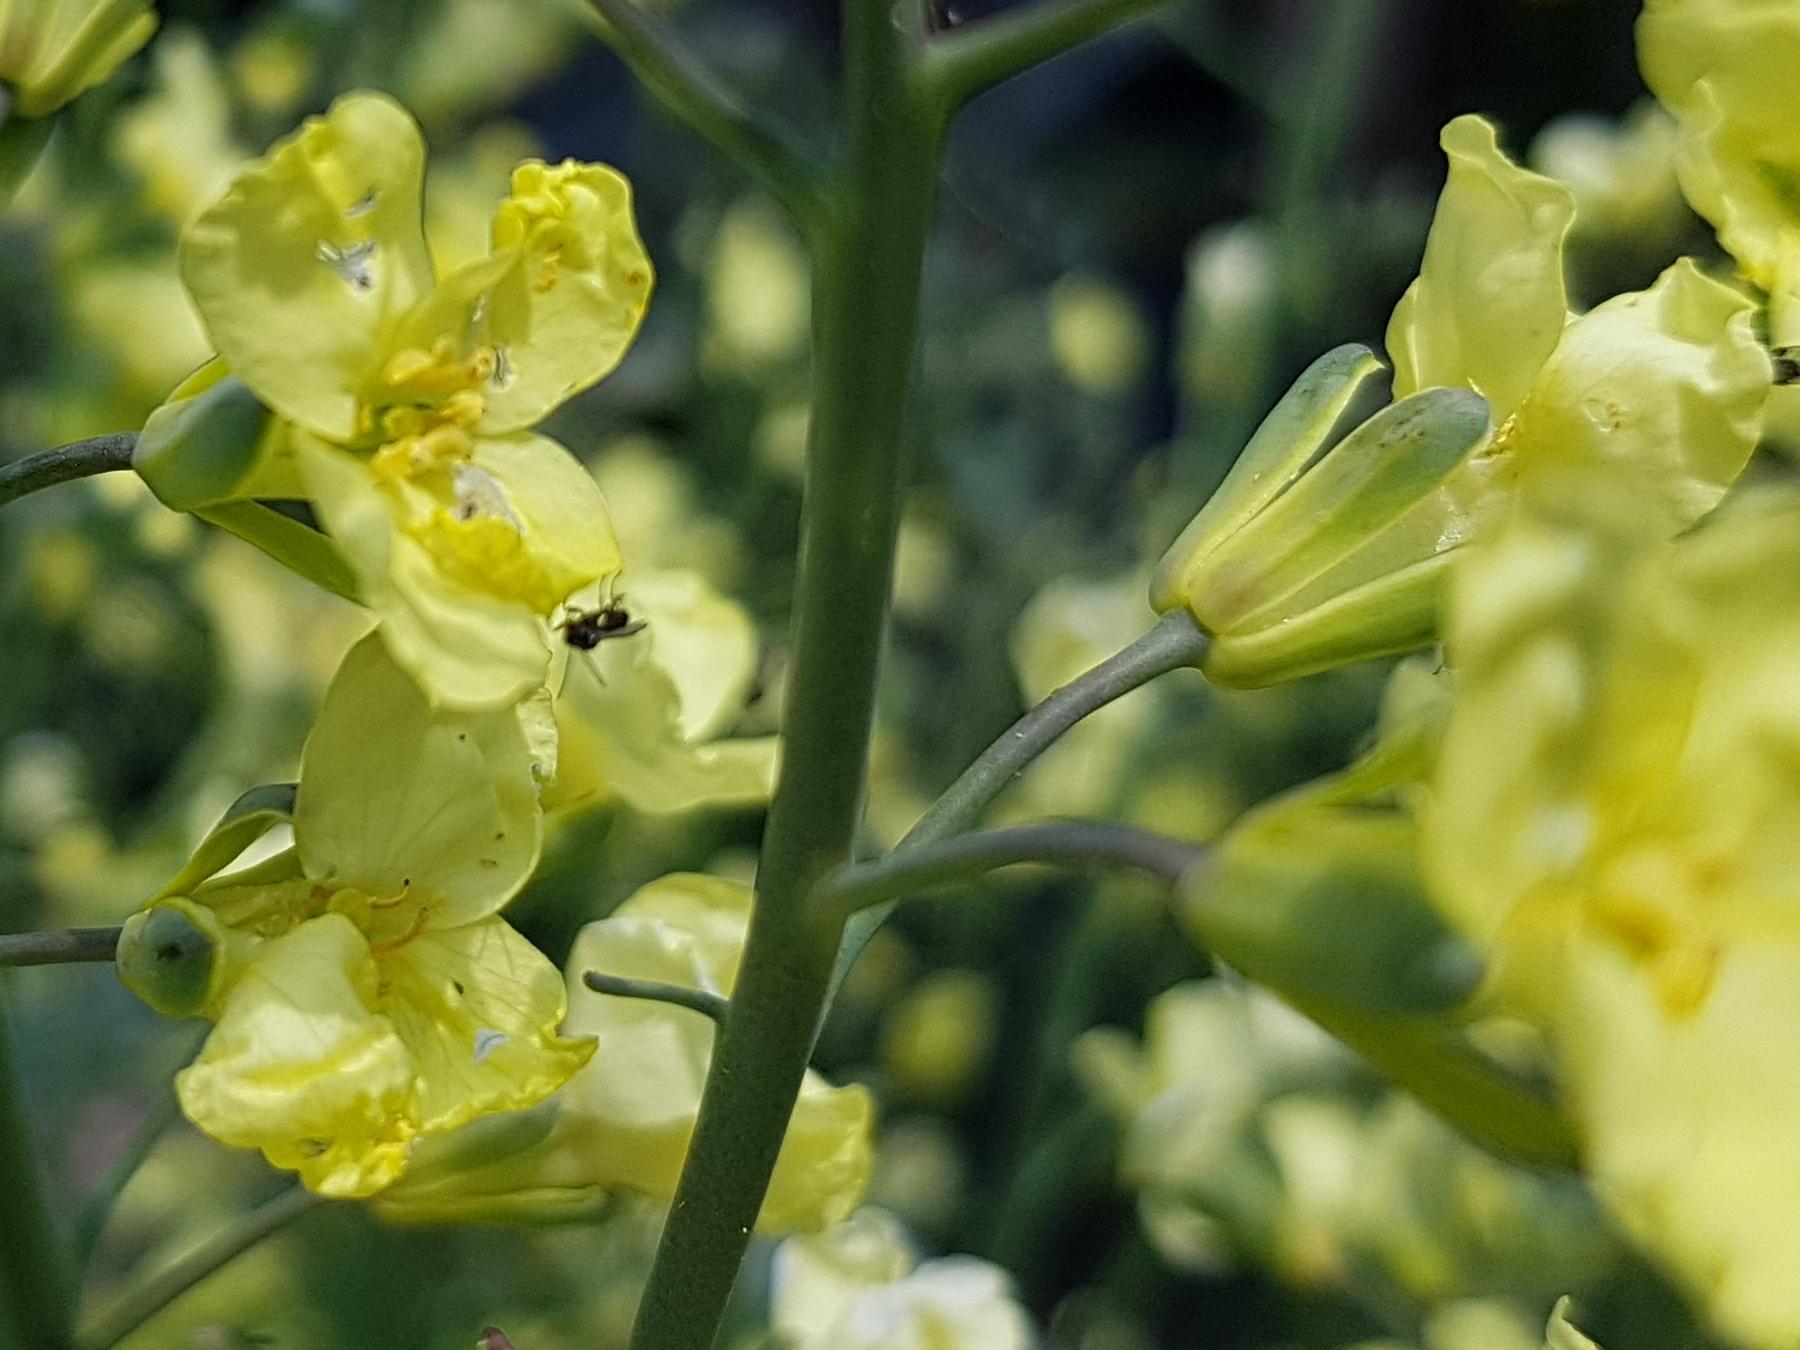 Brokkoli Blüte mit Wildbiene